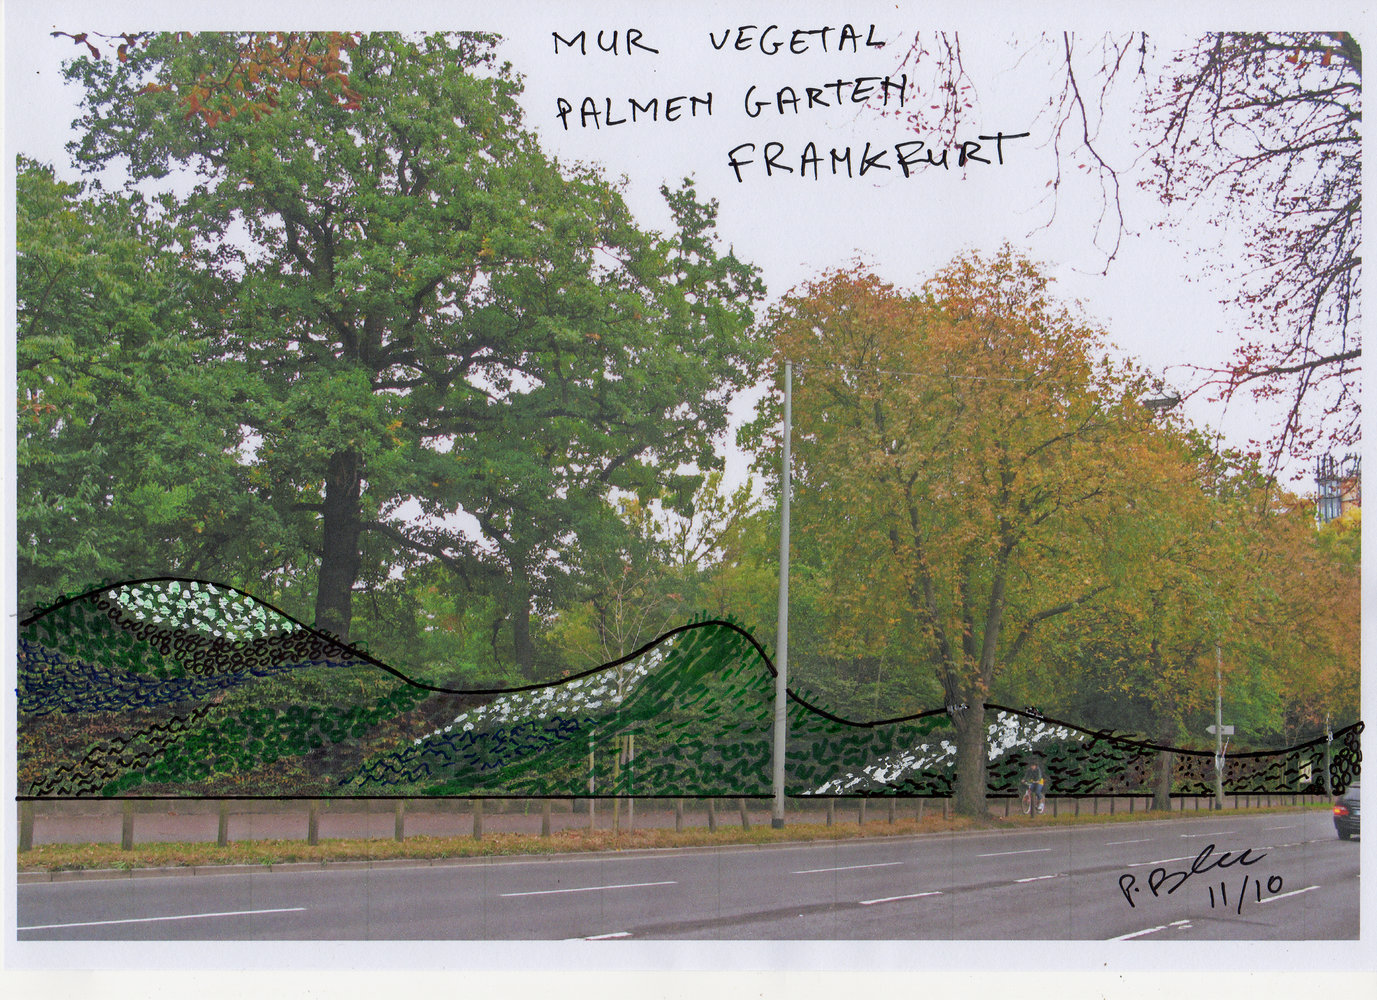 garten frankfurt, palmen garten, frankfurt | vertical garden patrick blanc, Design ideen